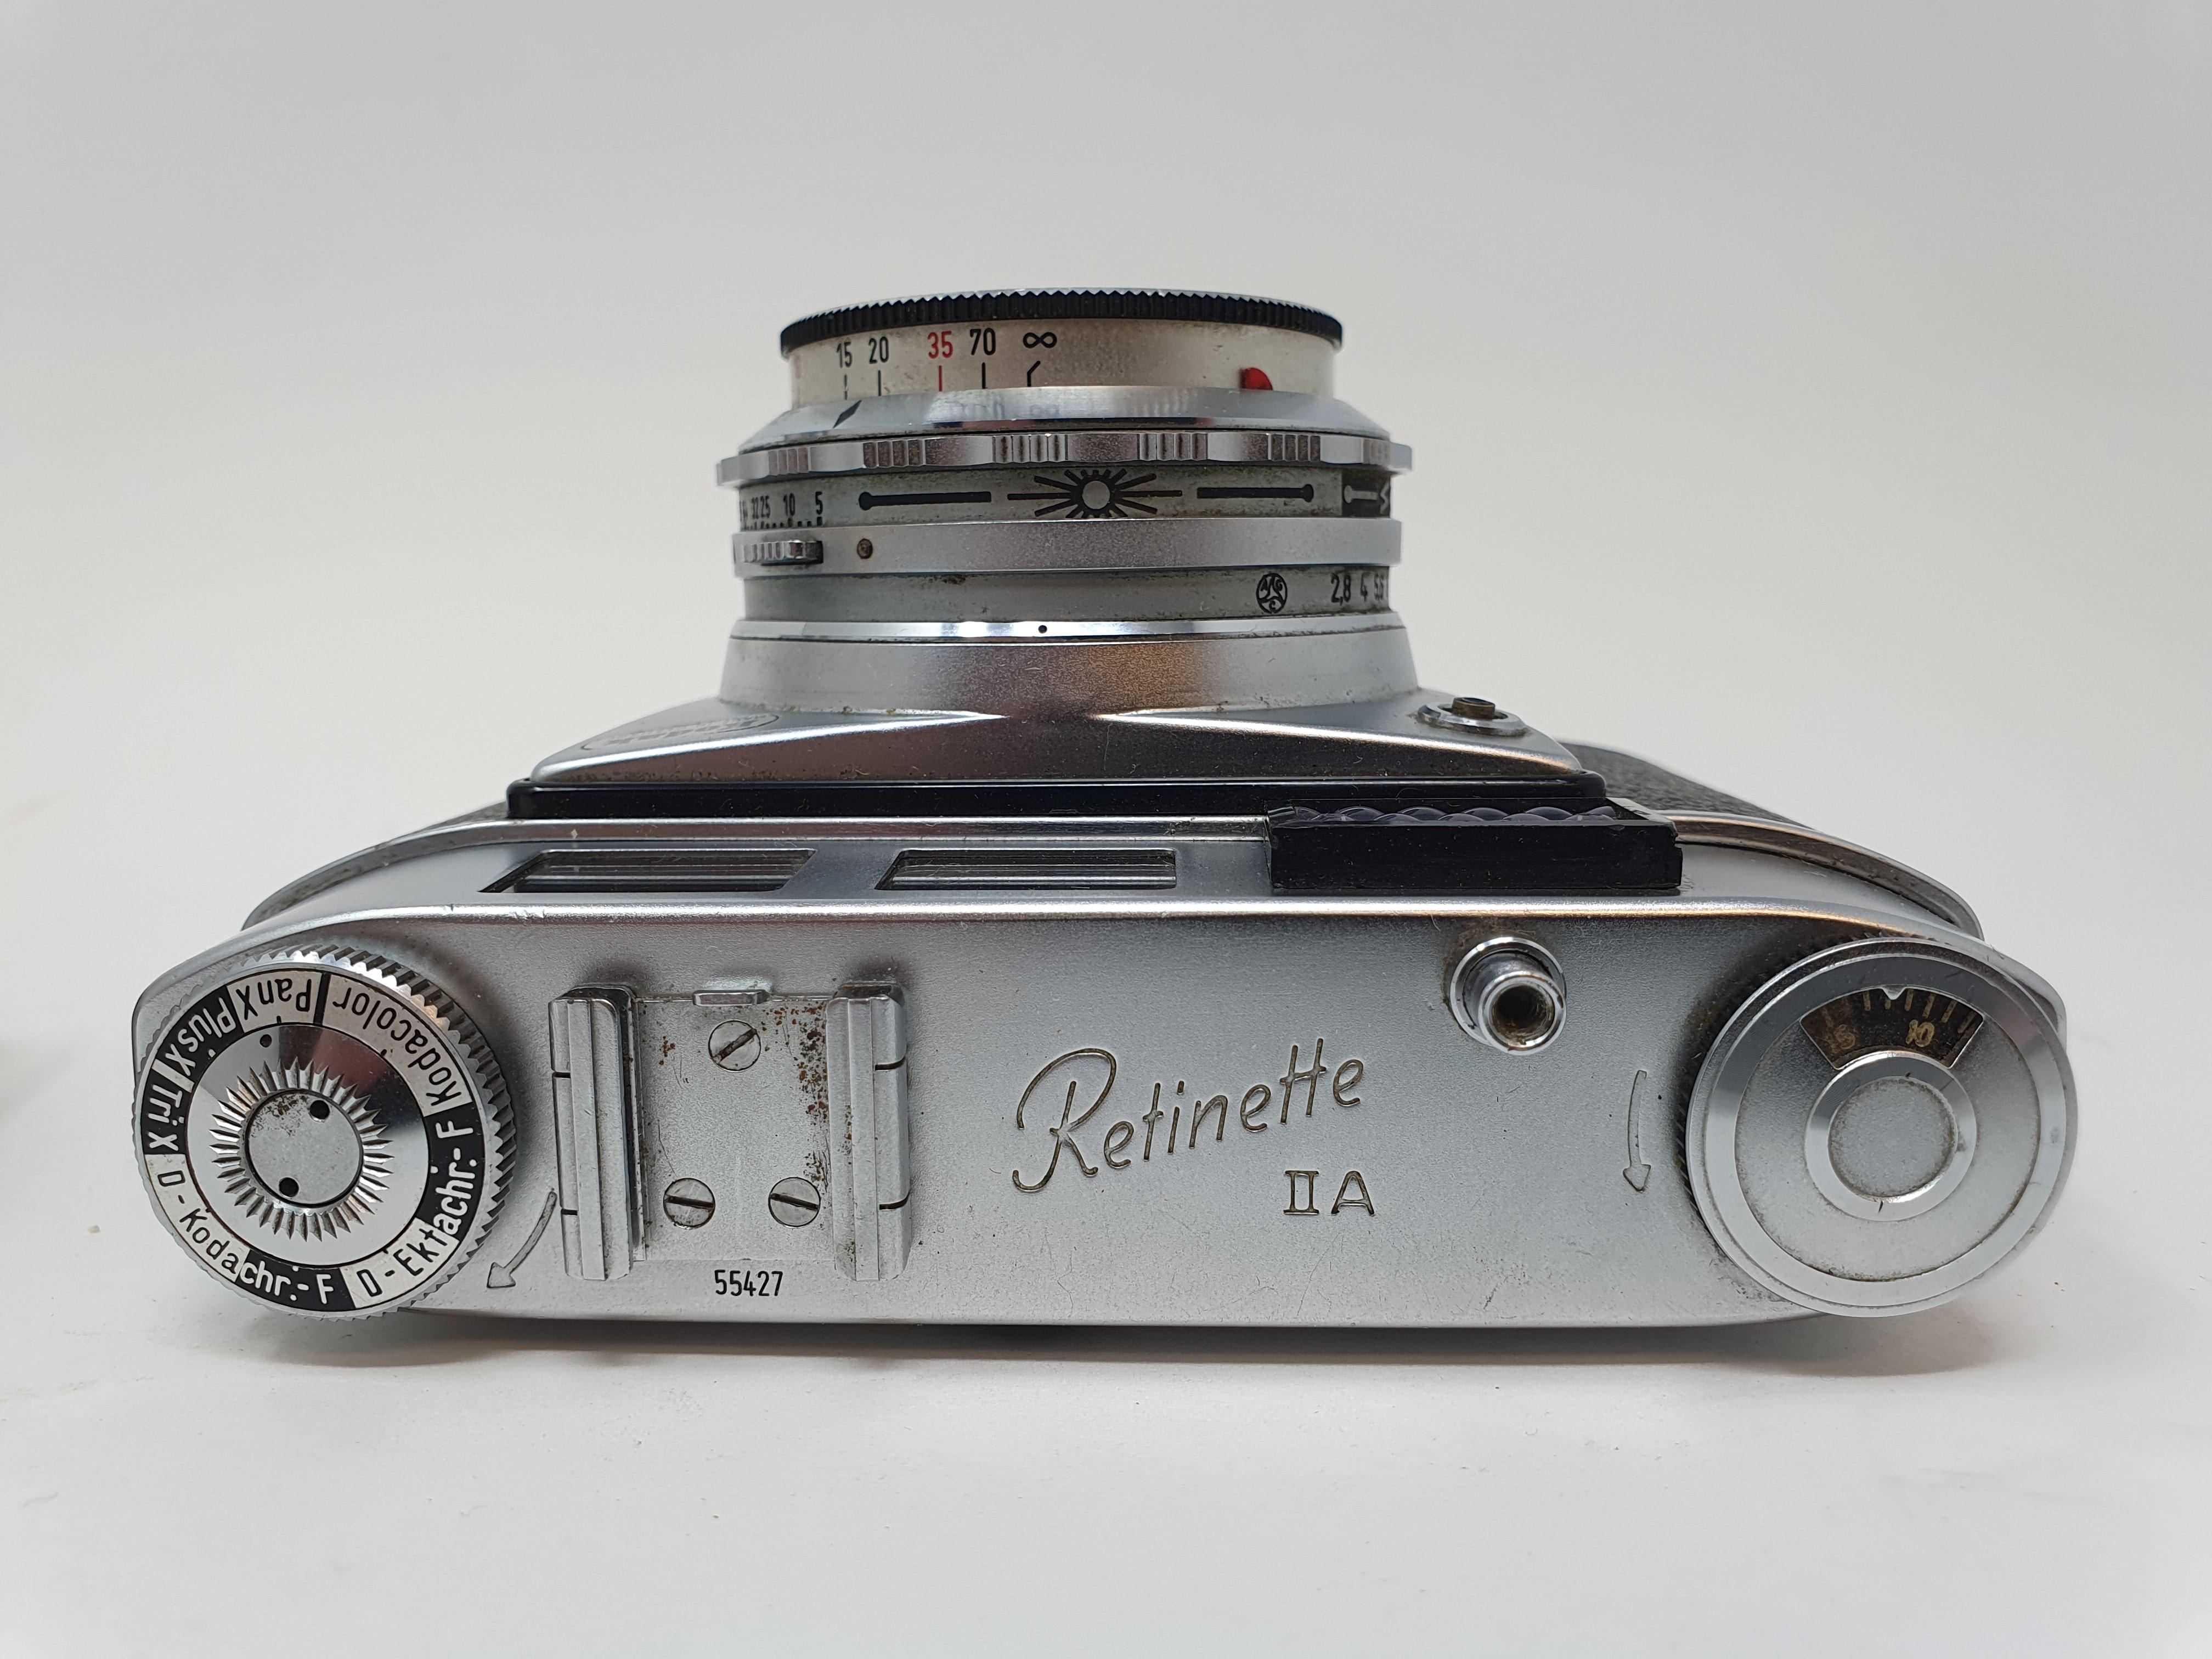 A Kodak Retinette IIA camera and a Braun Super Paxette camera (2) Provenance: Part of a vast - Image 4 of 4